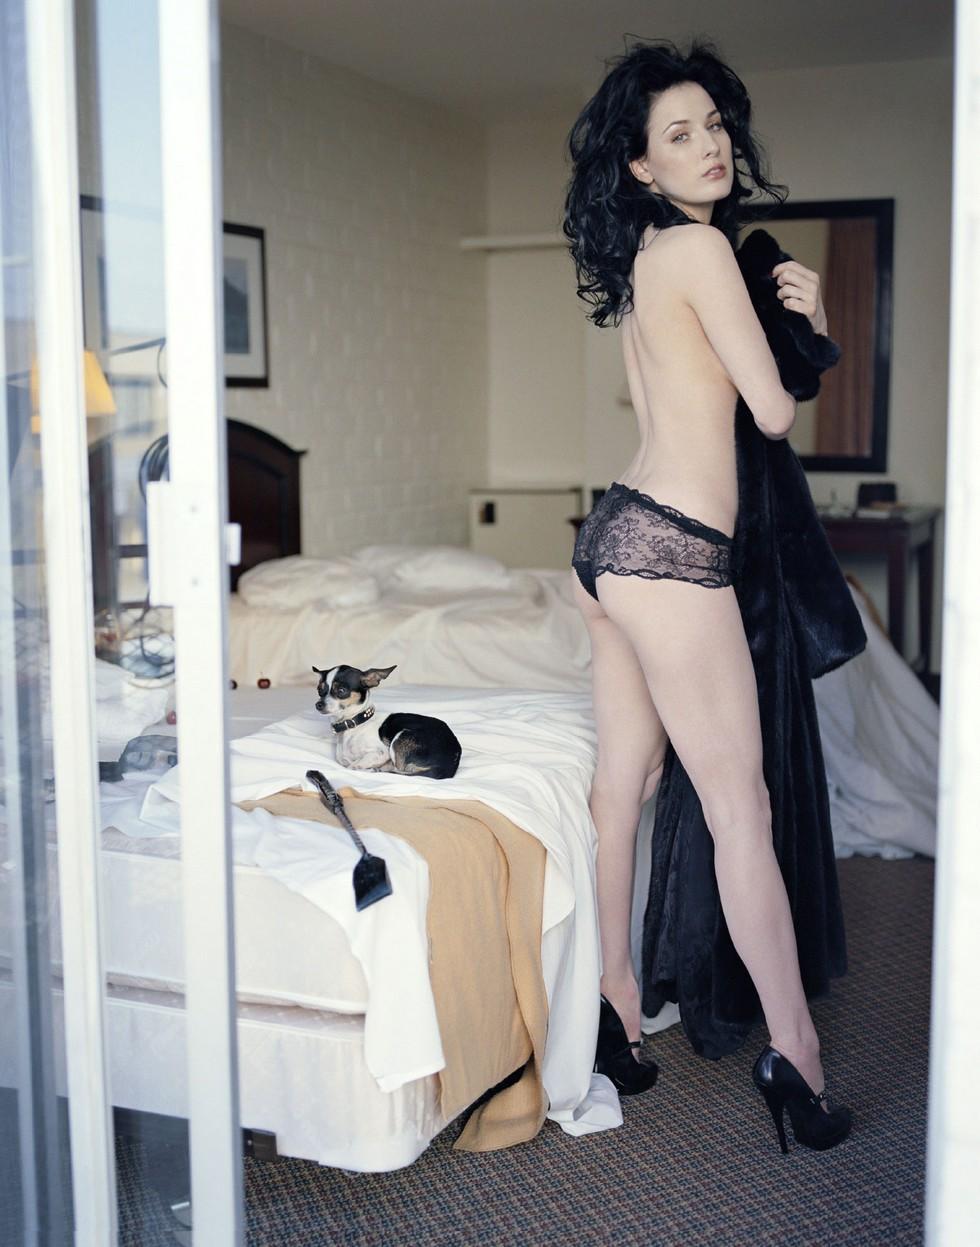 photo_stars_celebrites_feminines_dita_von_teese_hq_008